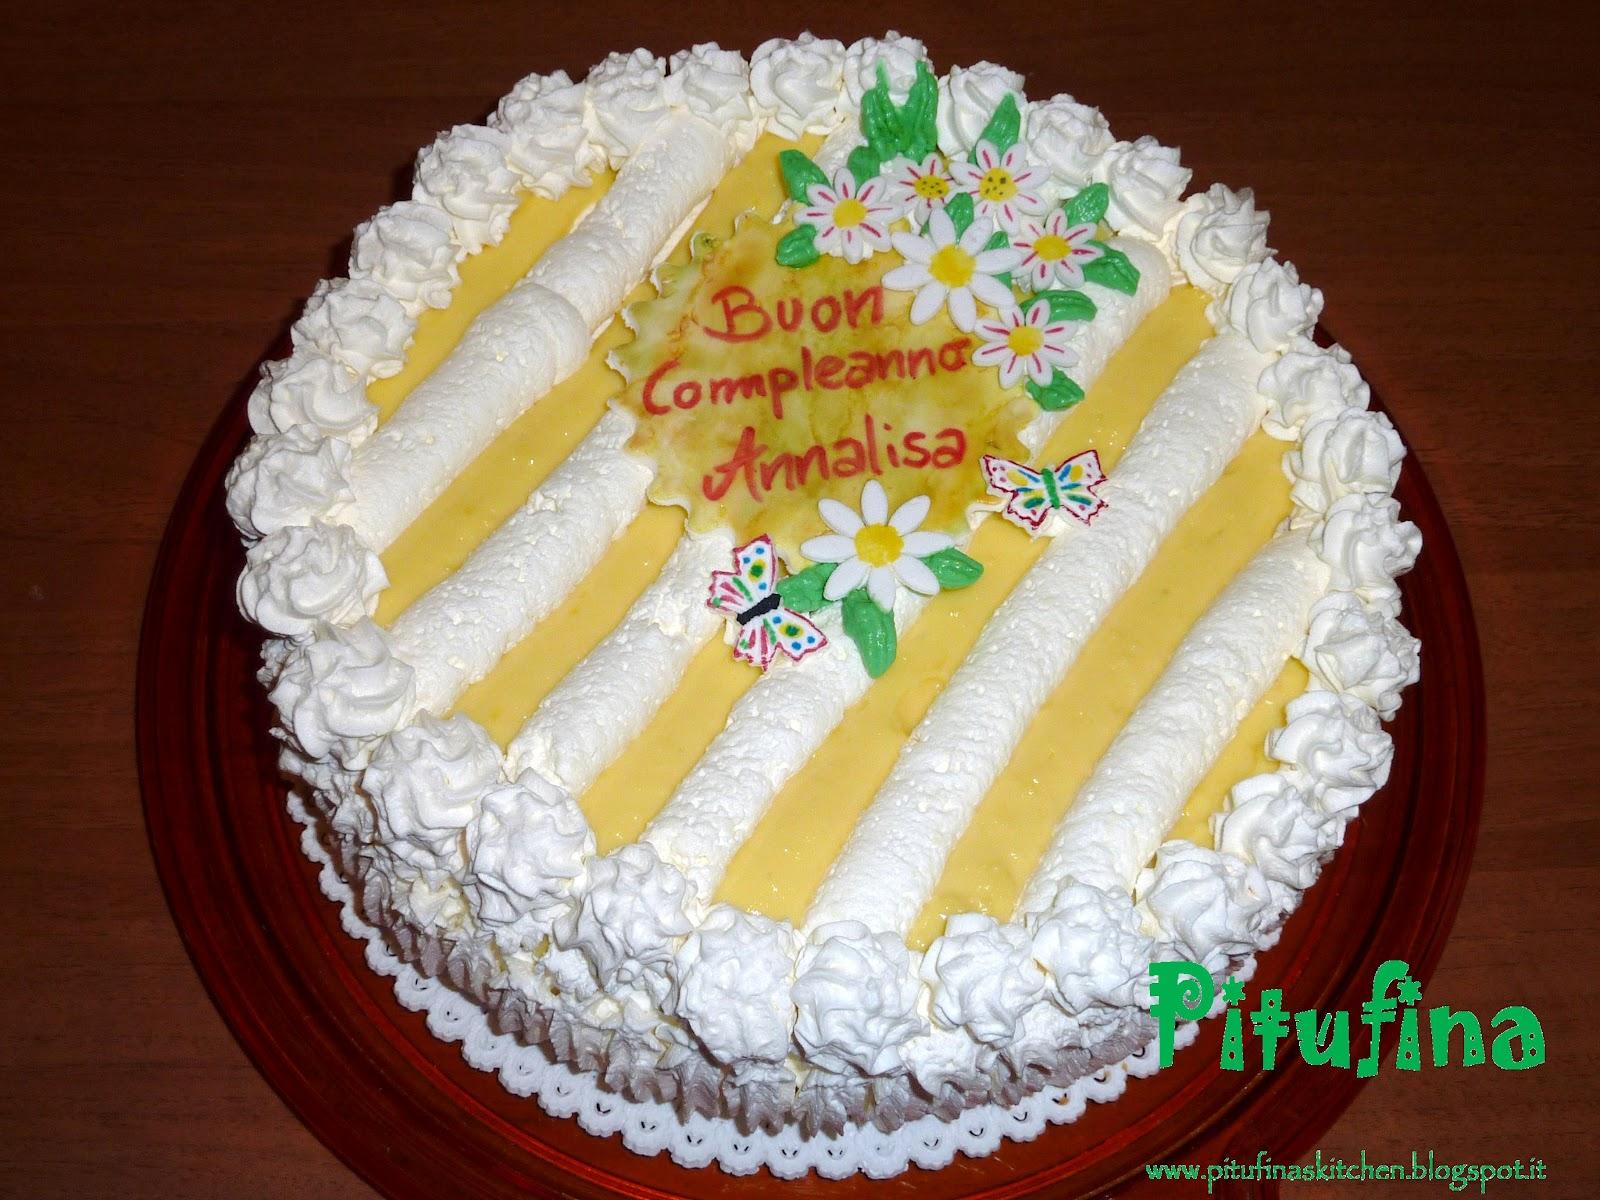 Pitufina 39 s kitchen torta chantilly - Decorare frigorifero ...